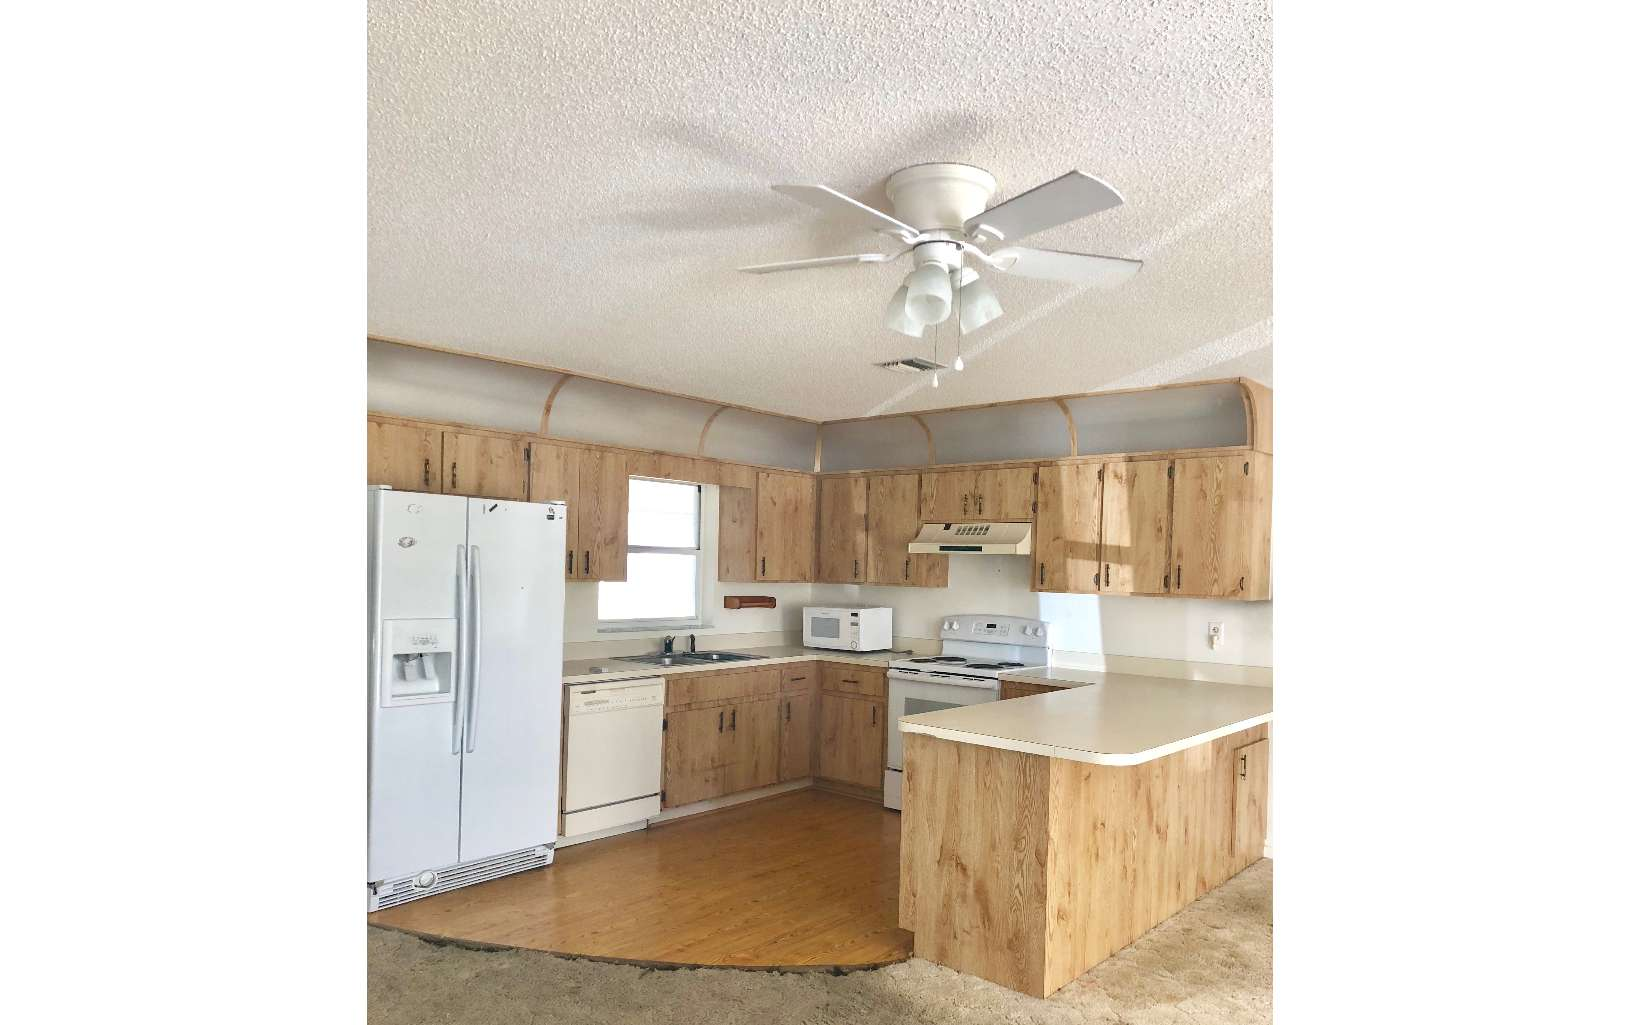 1769 Washington Blvd, Lake Placid, FL 33852